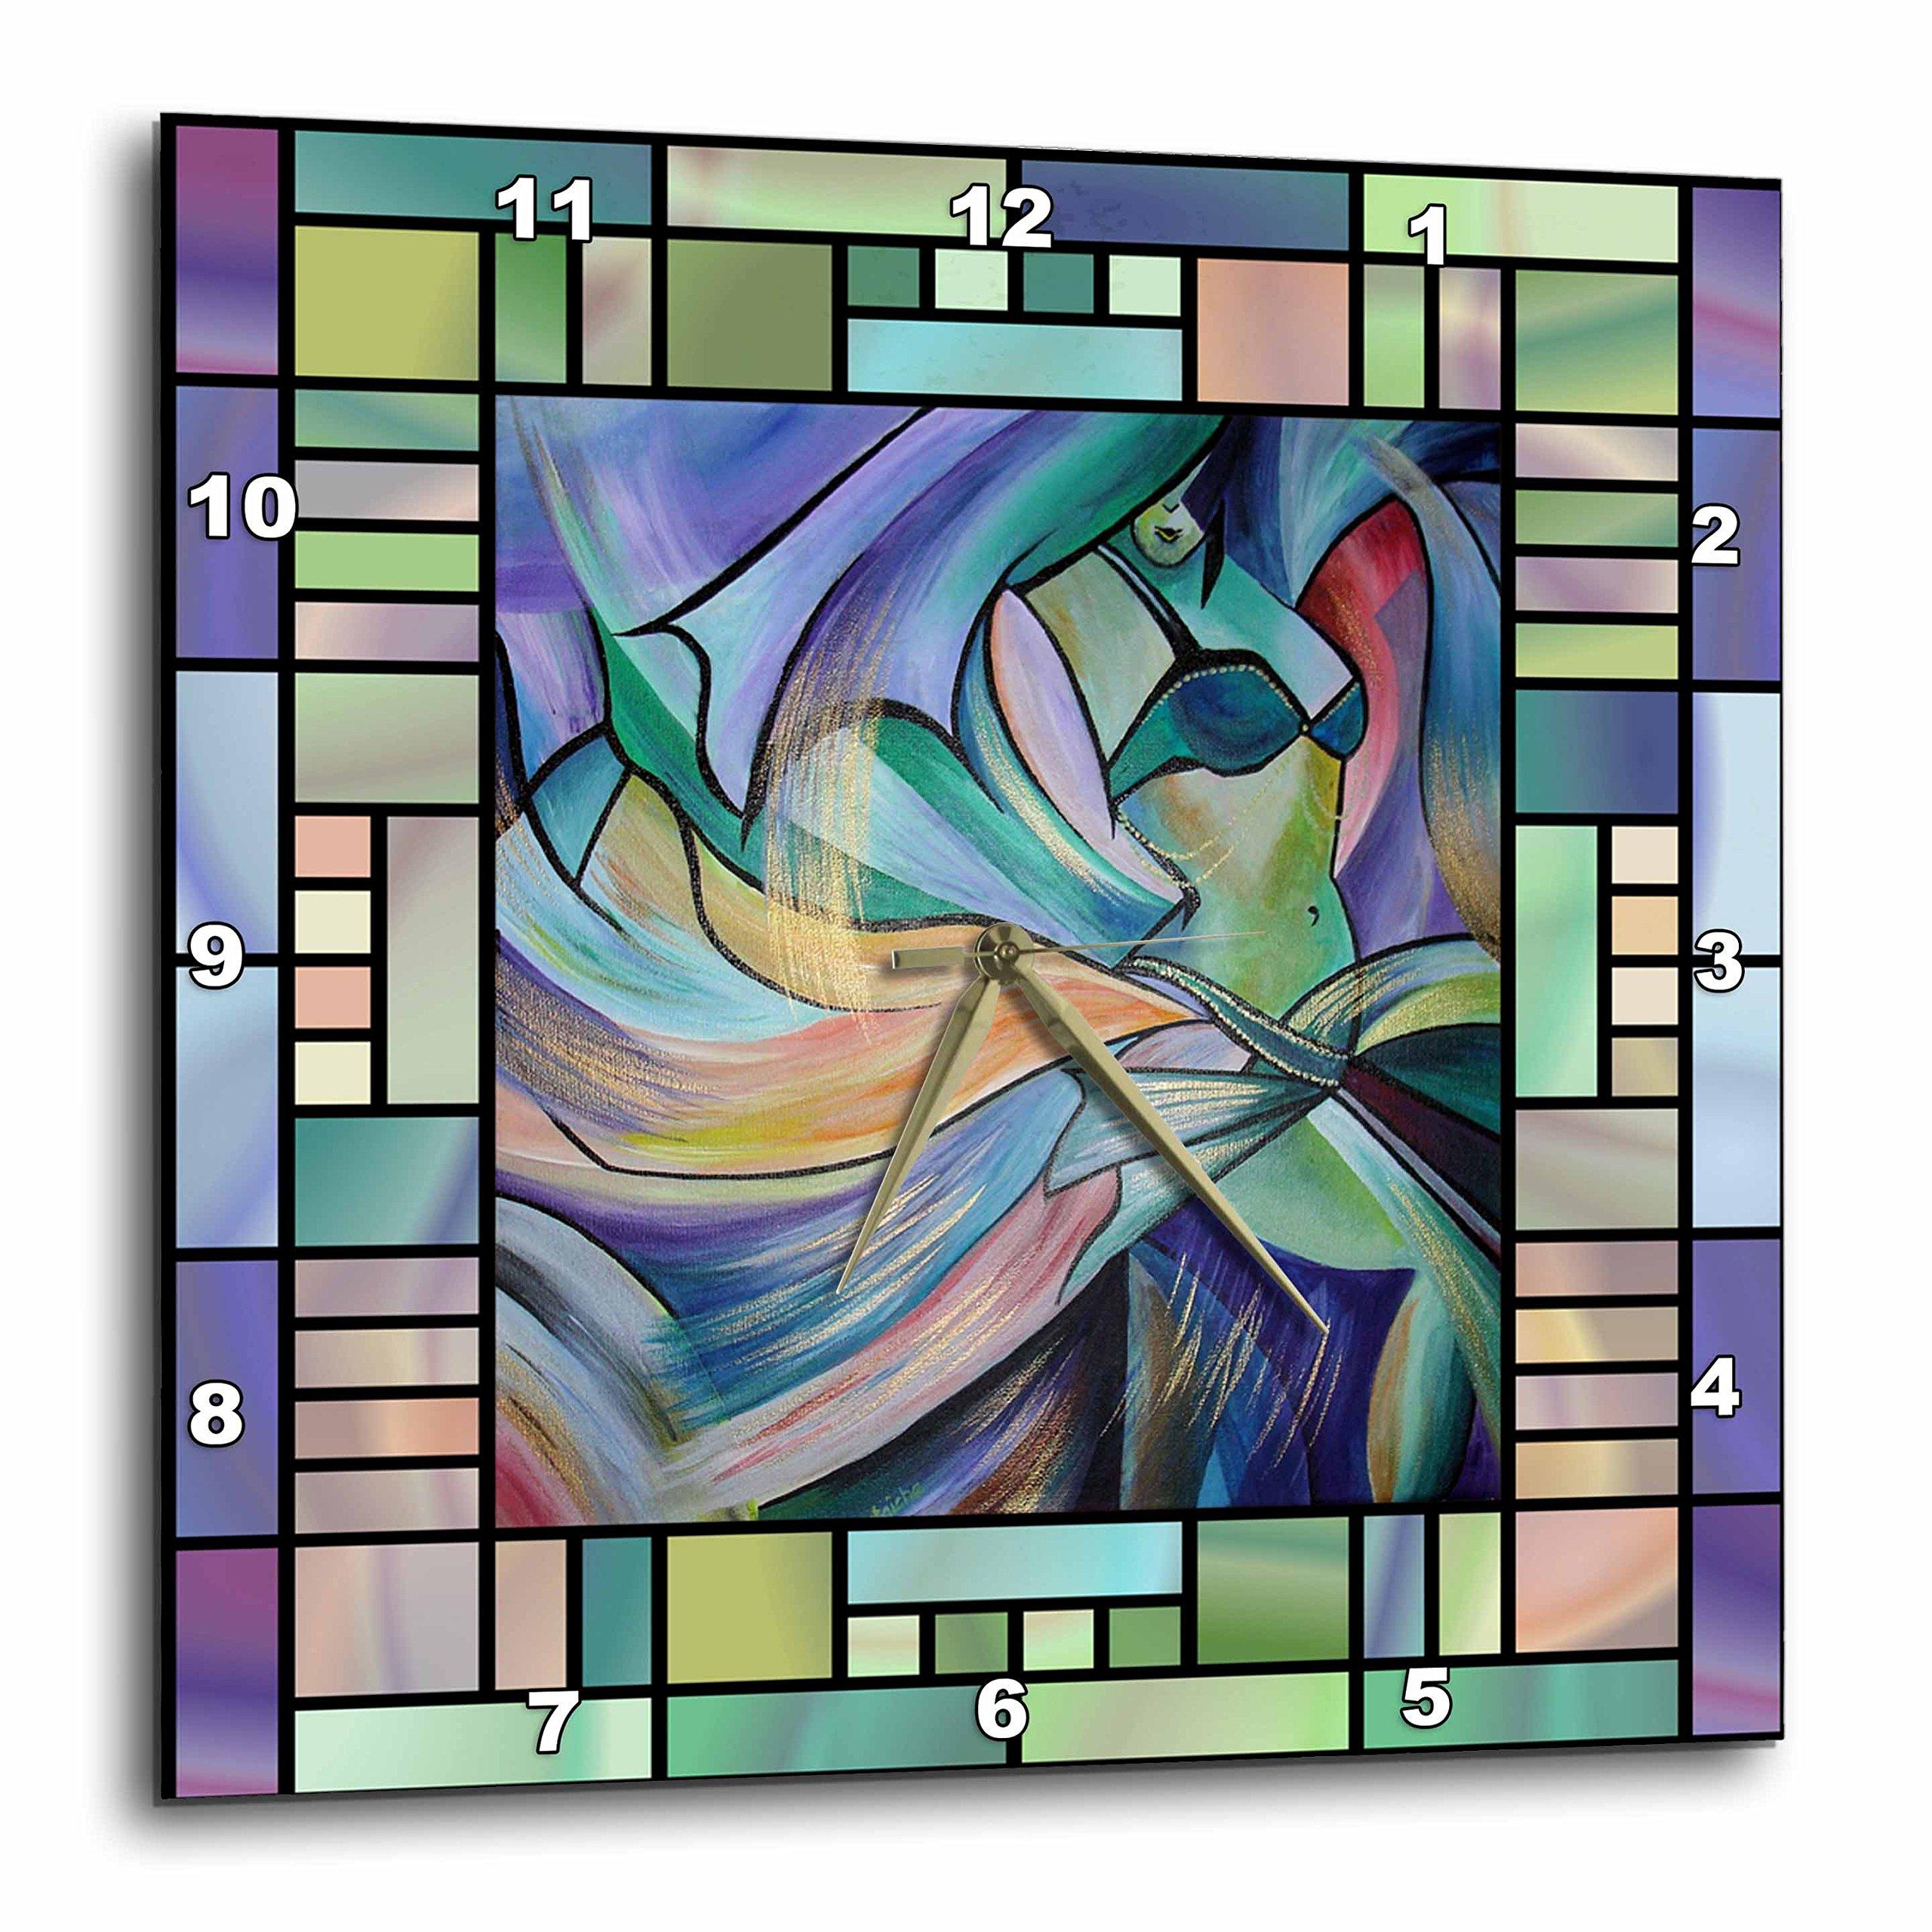 3dRose dpp_46761_2 Art Deco Dancer Dance, Dancing, Belly Dance, Bellydance, Oriental Dance, Middle Eastern Dance, Wall Clock, 13 by 13-Inch